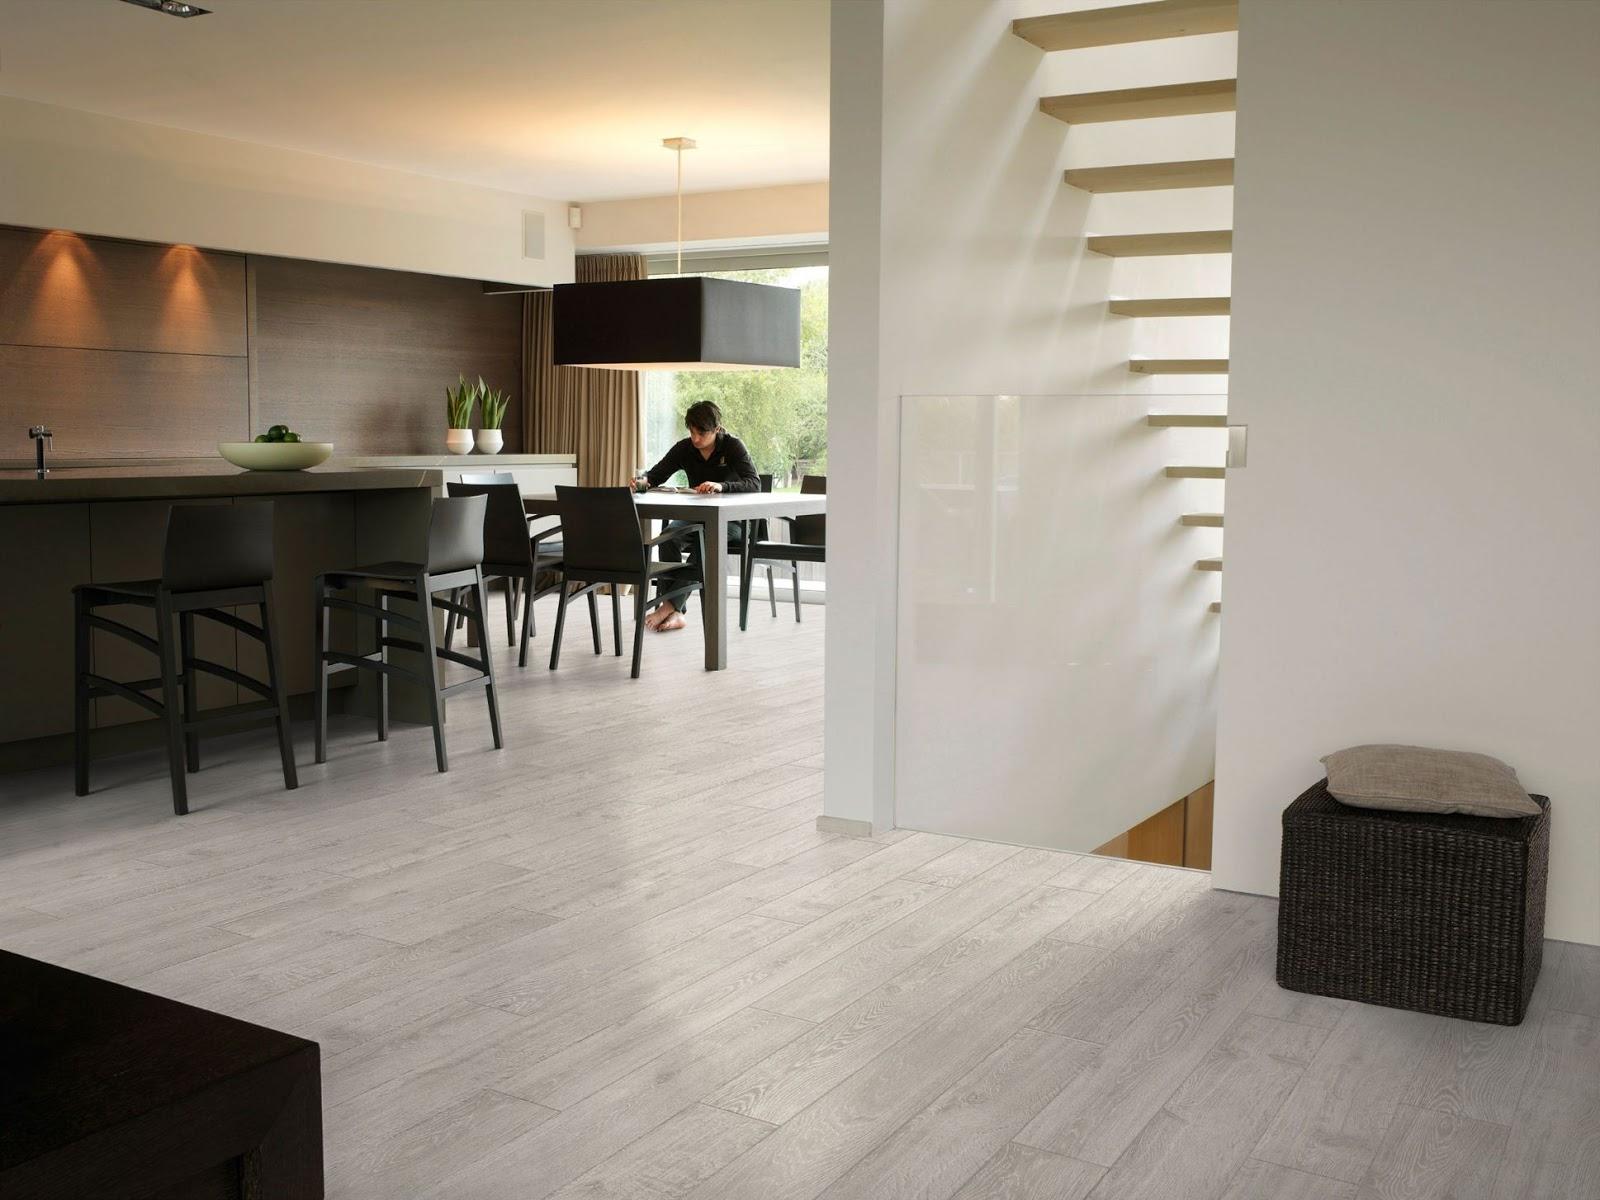 Modern Laminate Flooring flooring city high quality 12mm handscraped laminate flooring laminate flooring Modern Laminate Floor Design